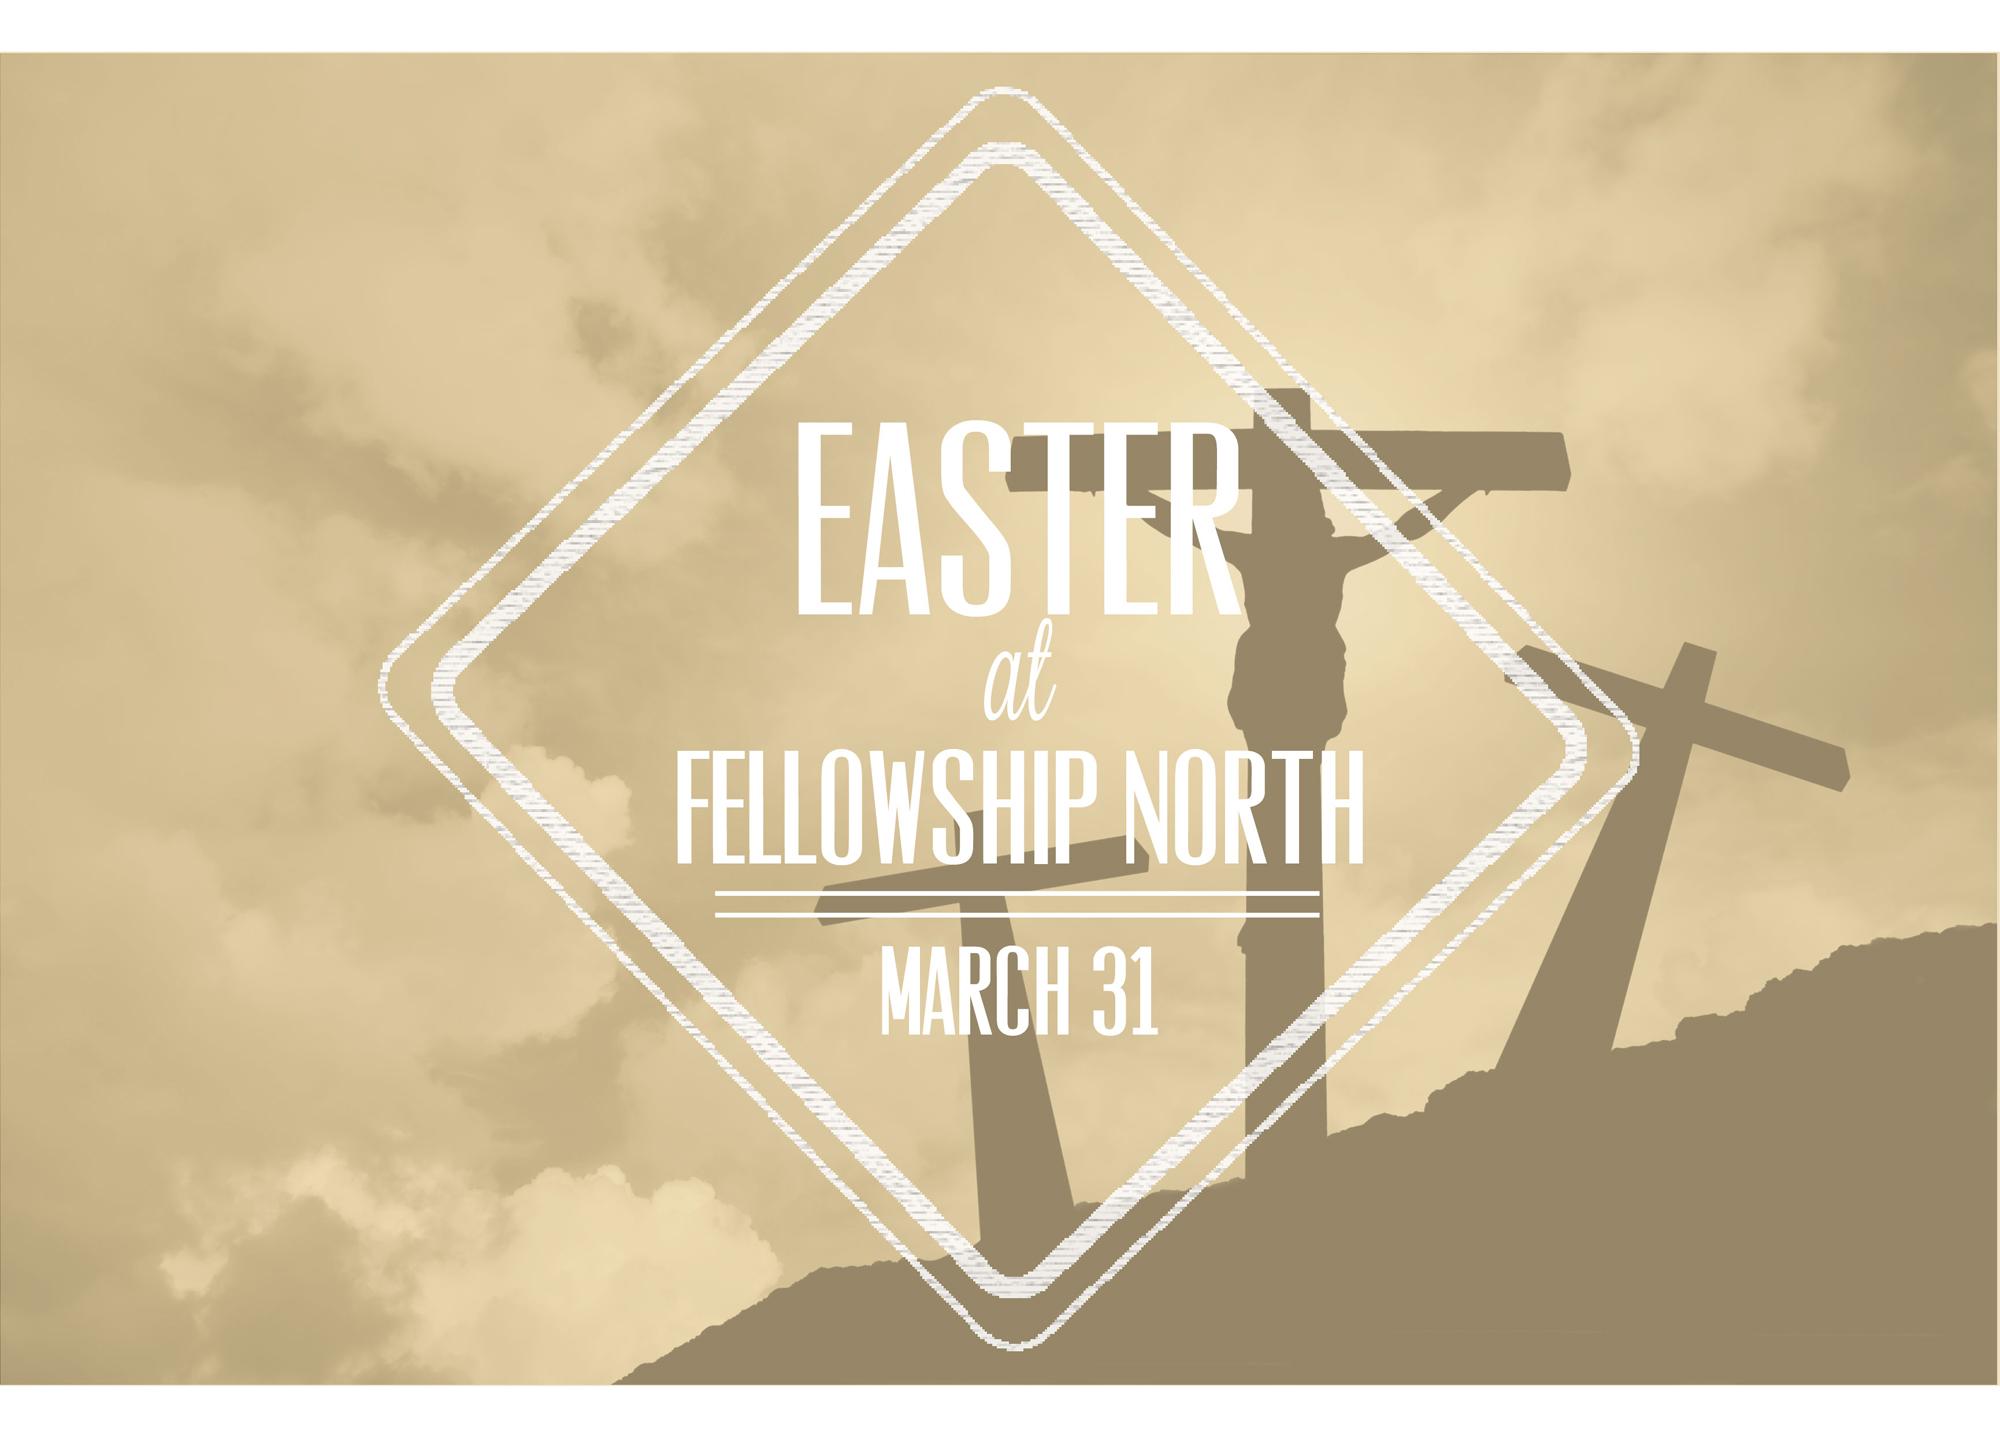 Fellowship North